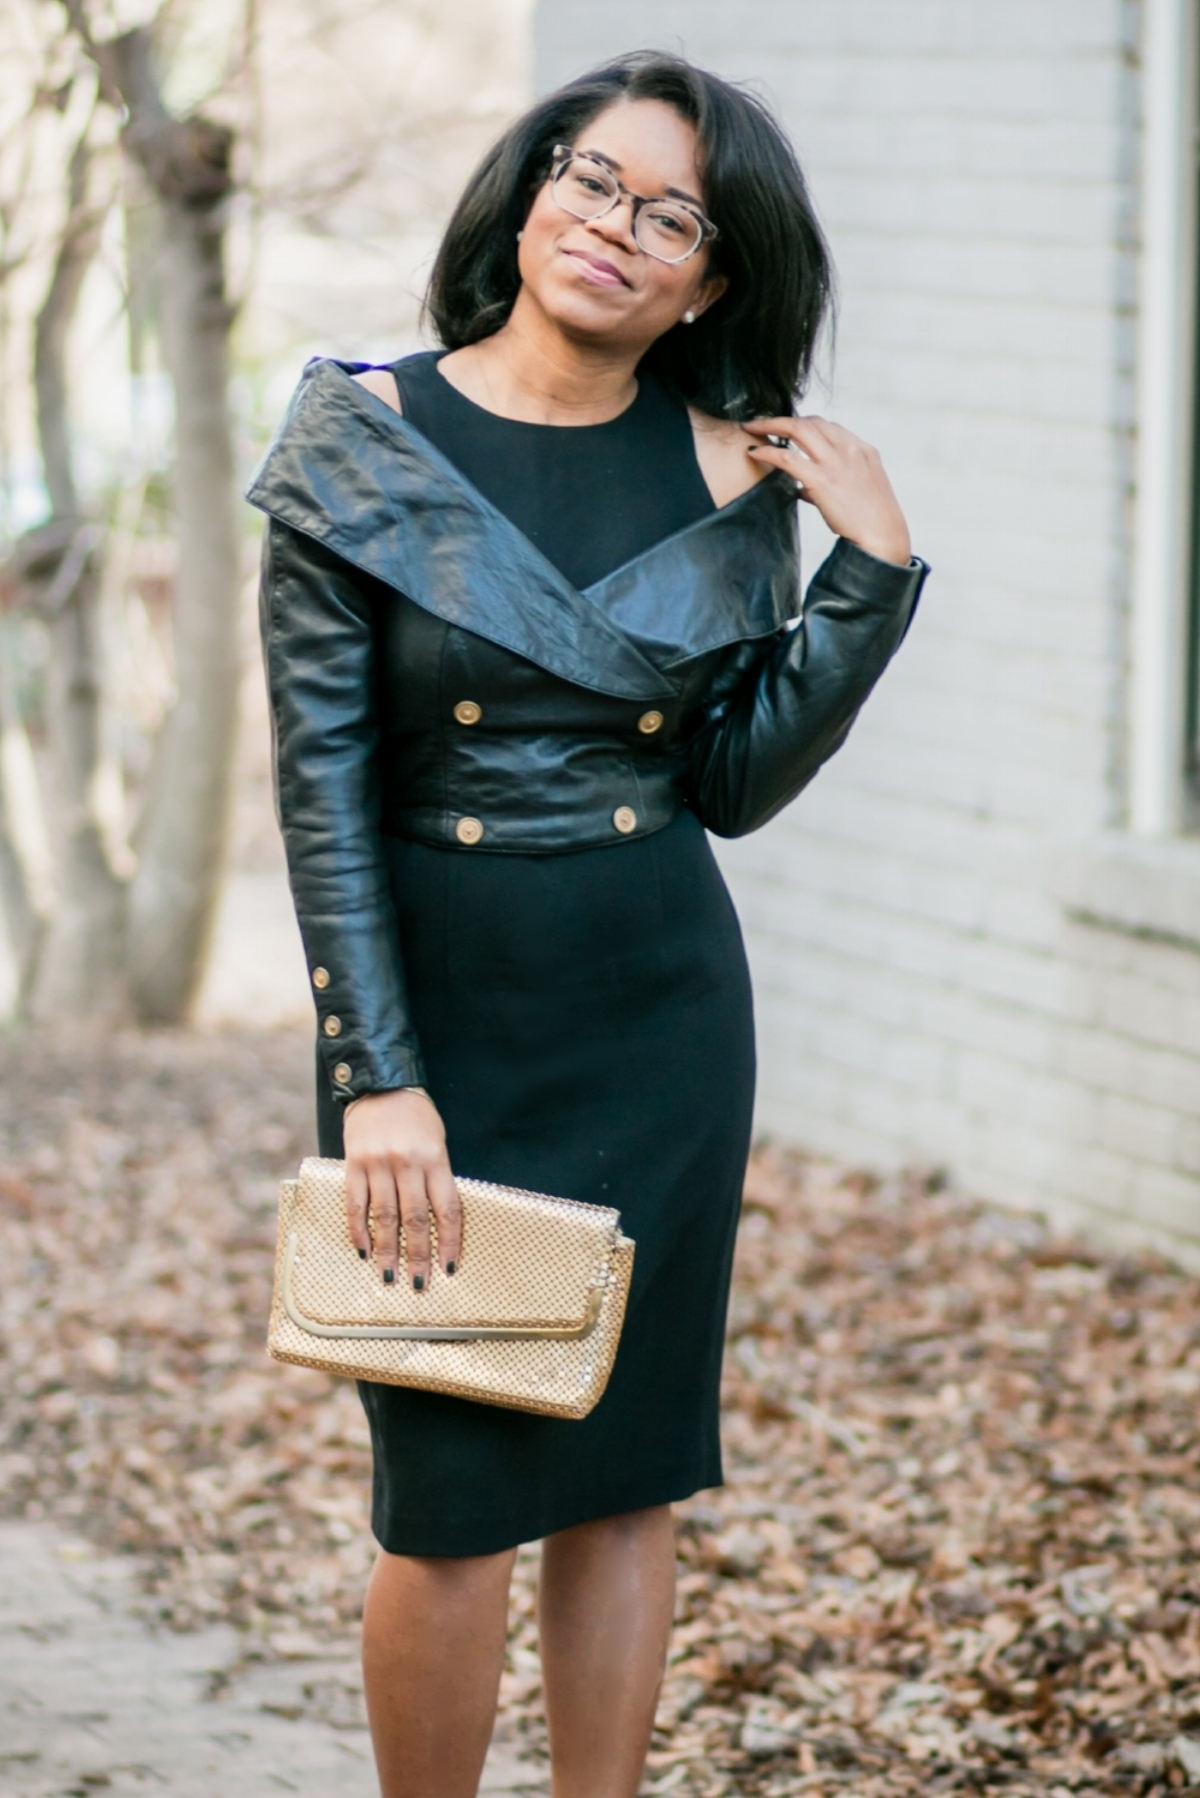 niki mcneill lifestyle blogger Raleigh nc north carolina